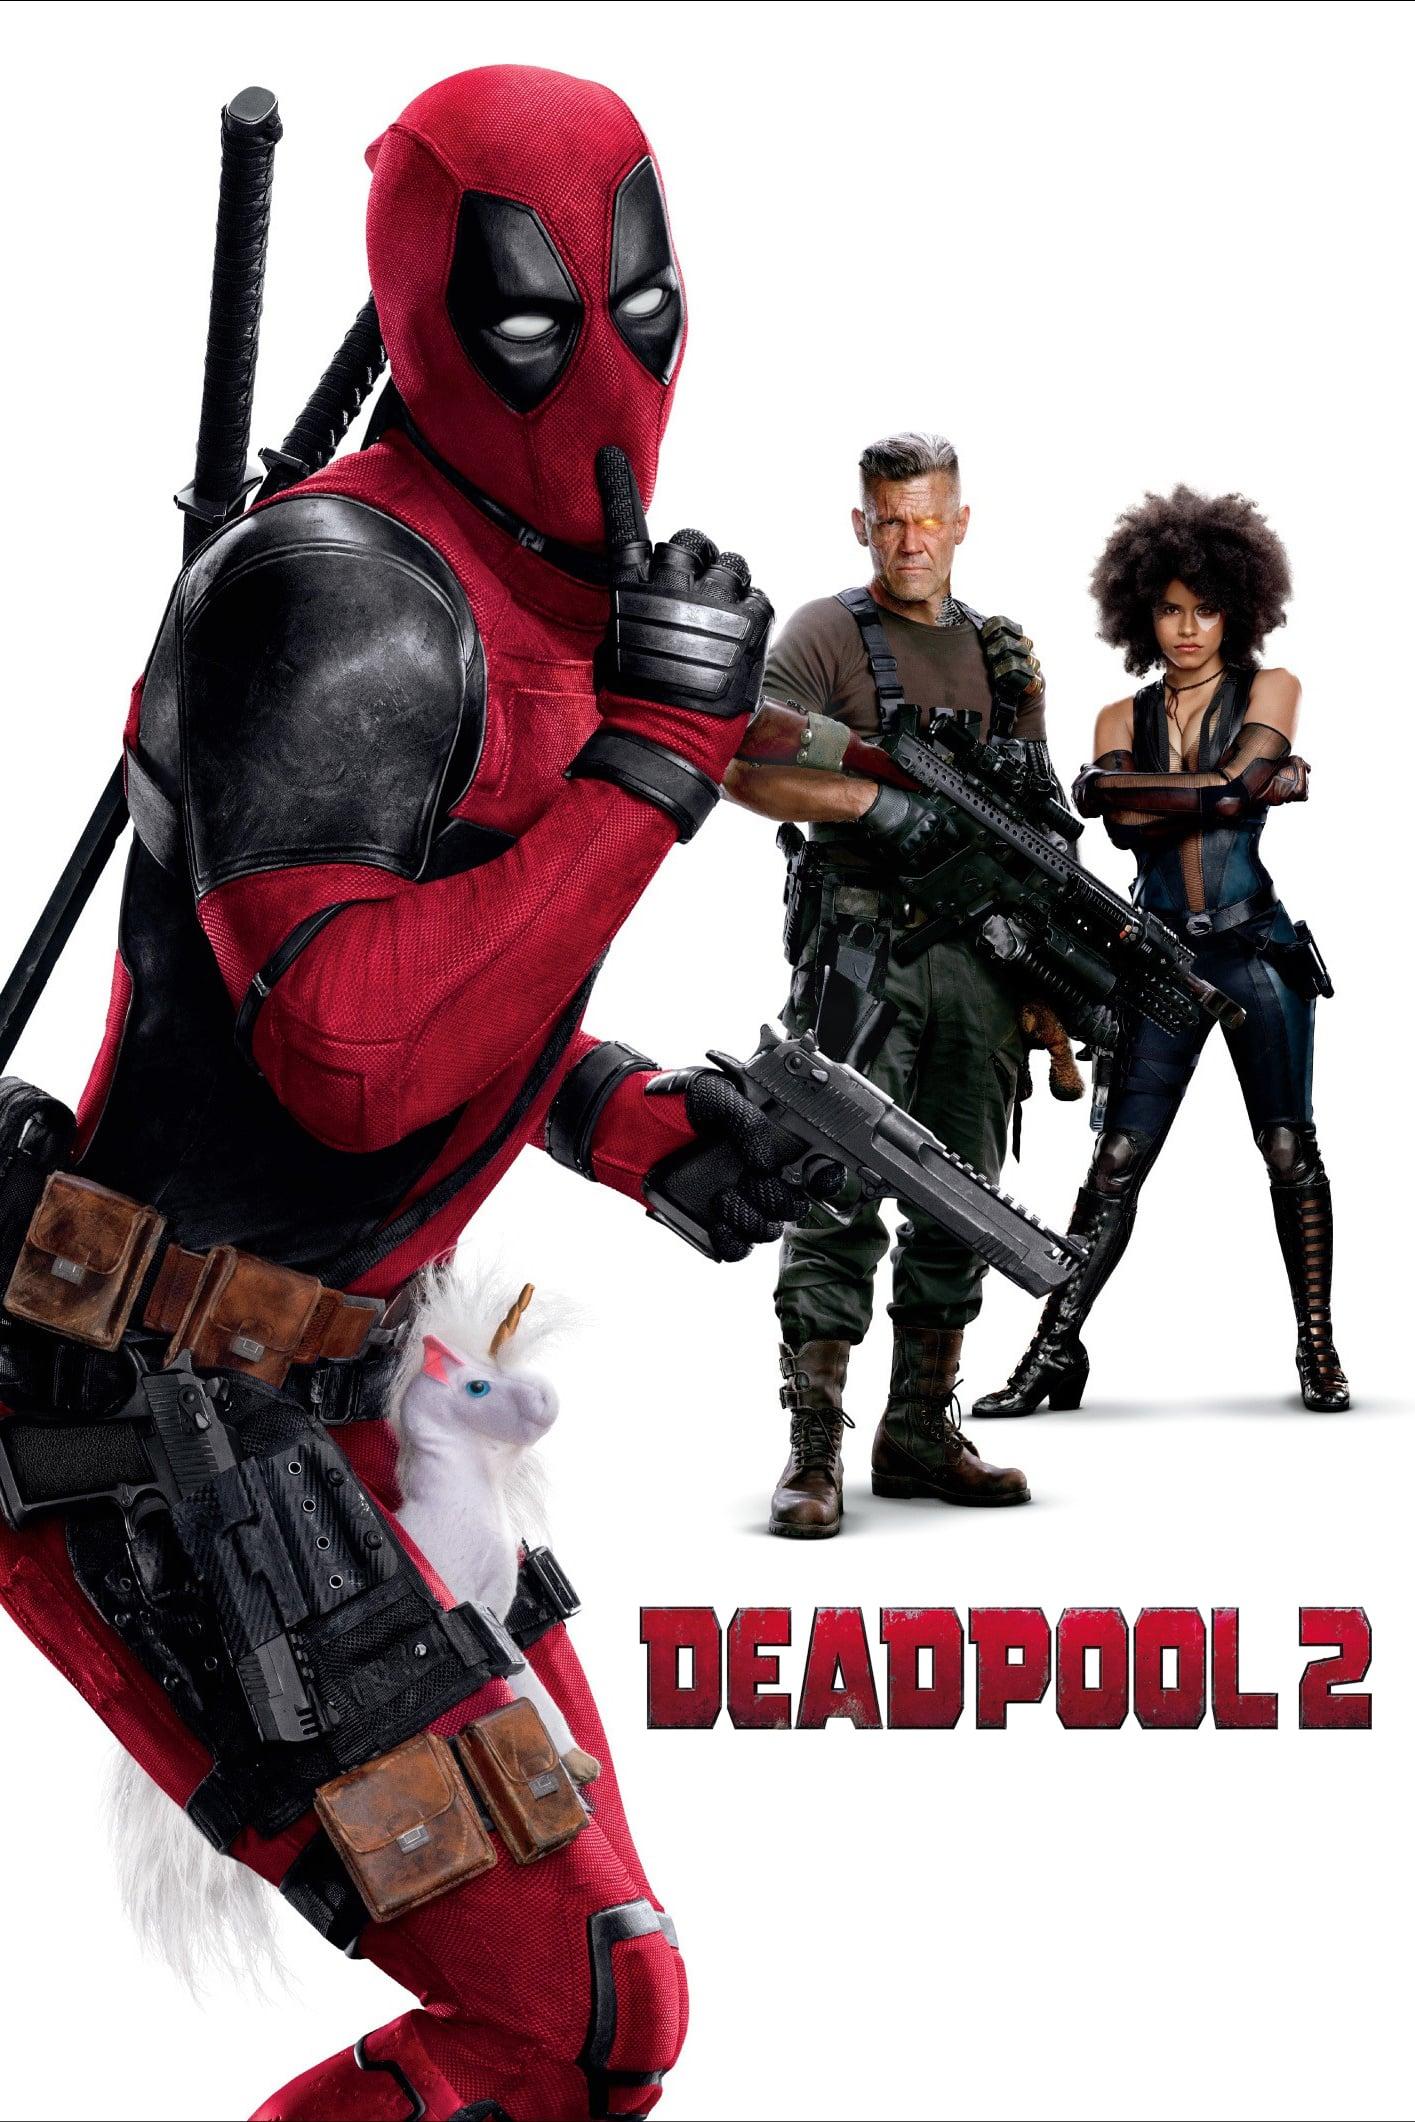 Deadpool 2 (2018) [BluRay] [1080p] Descarga Pelicula Torrent